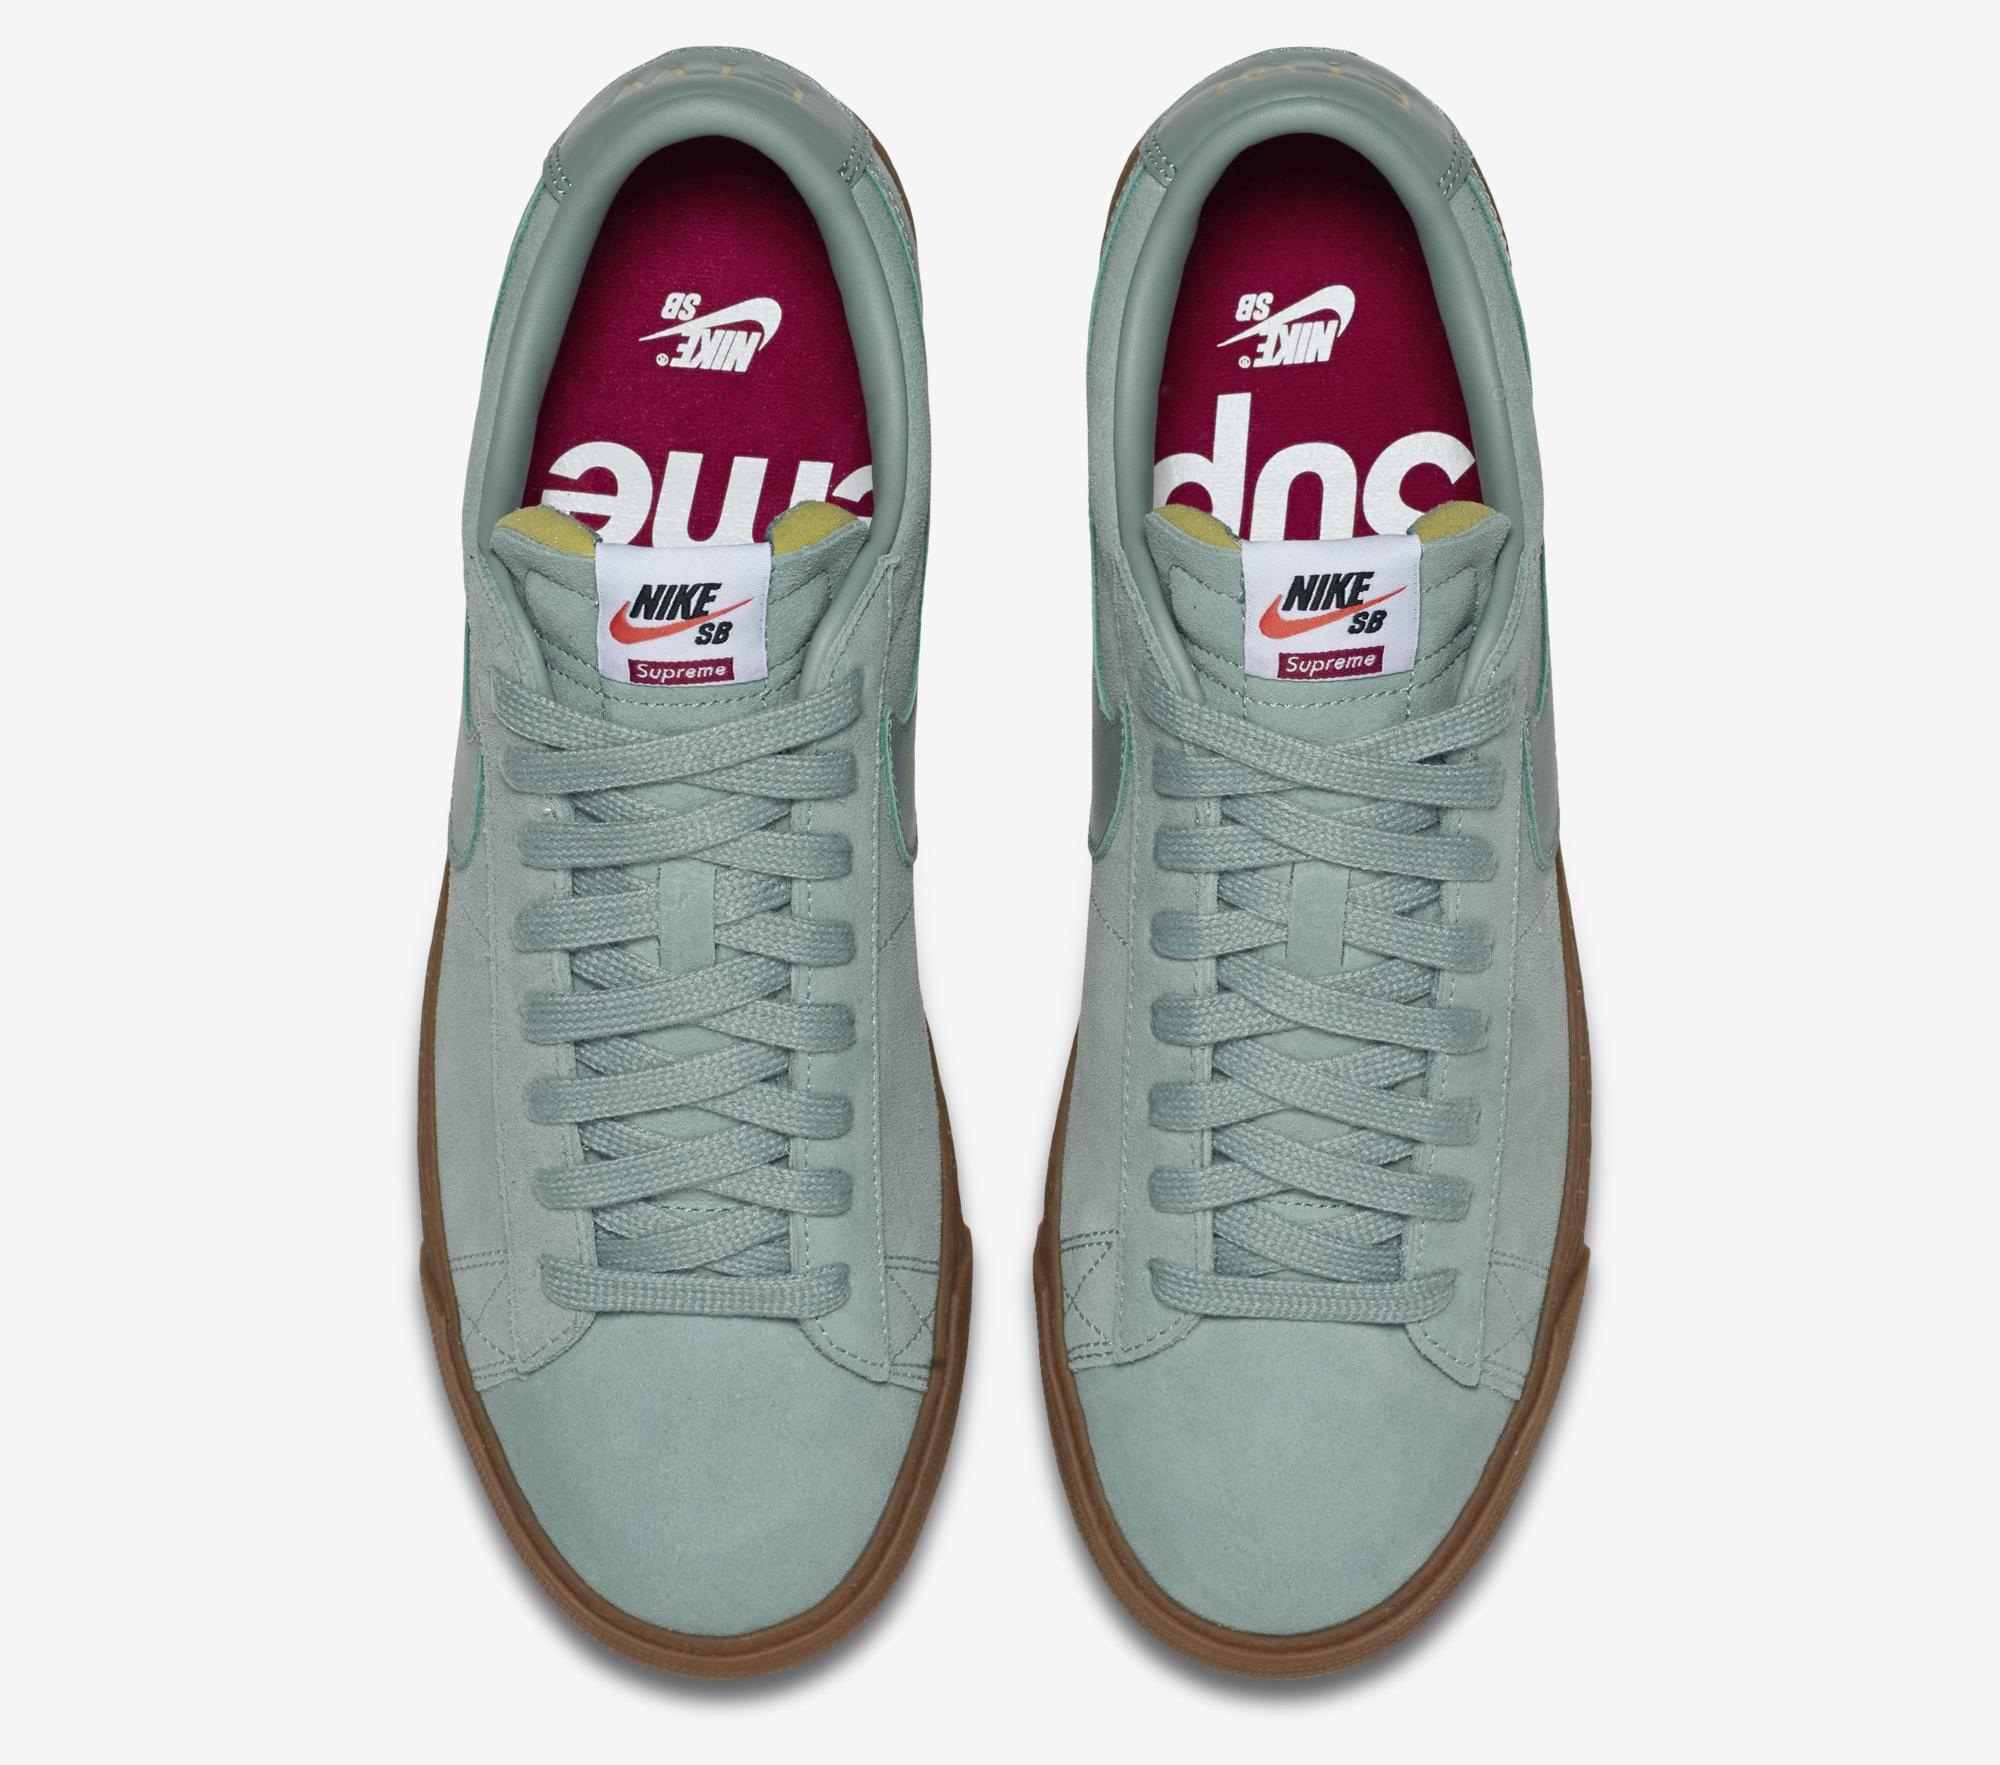 sale retailer 0bff1 38e3b You Can Buy The Supreme x Nike SB Blazer Low GT Again ...